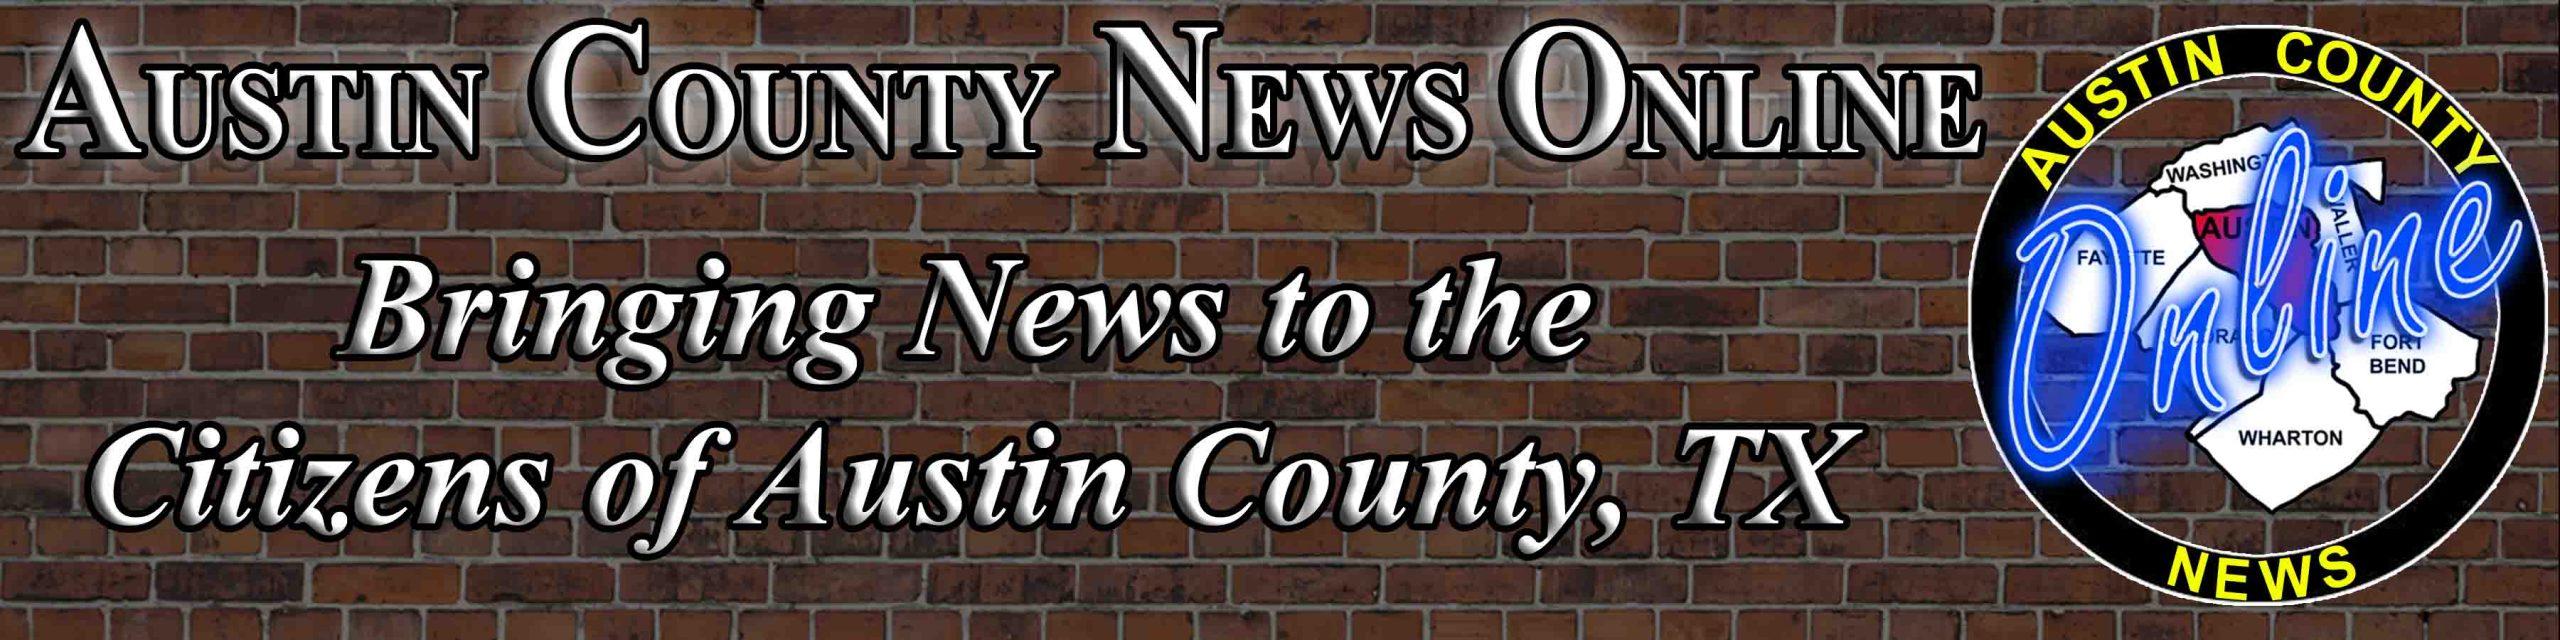 Austin County News Online